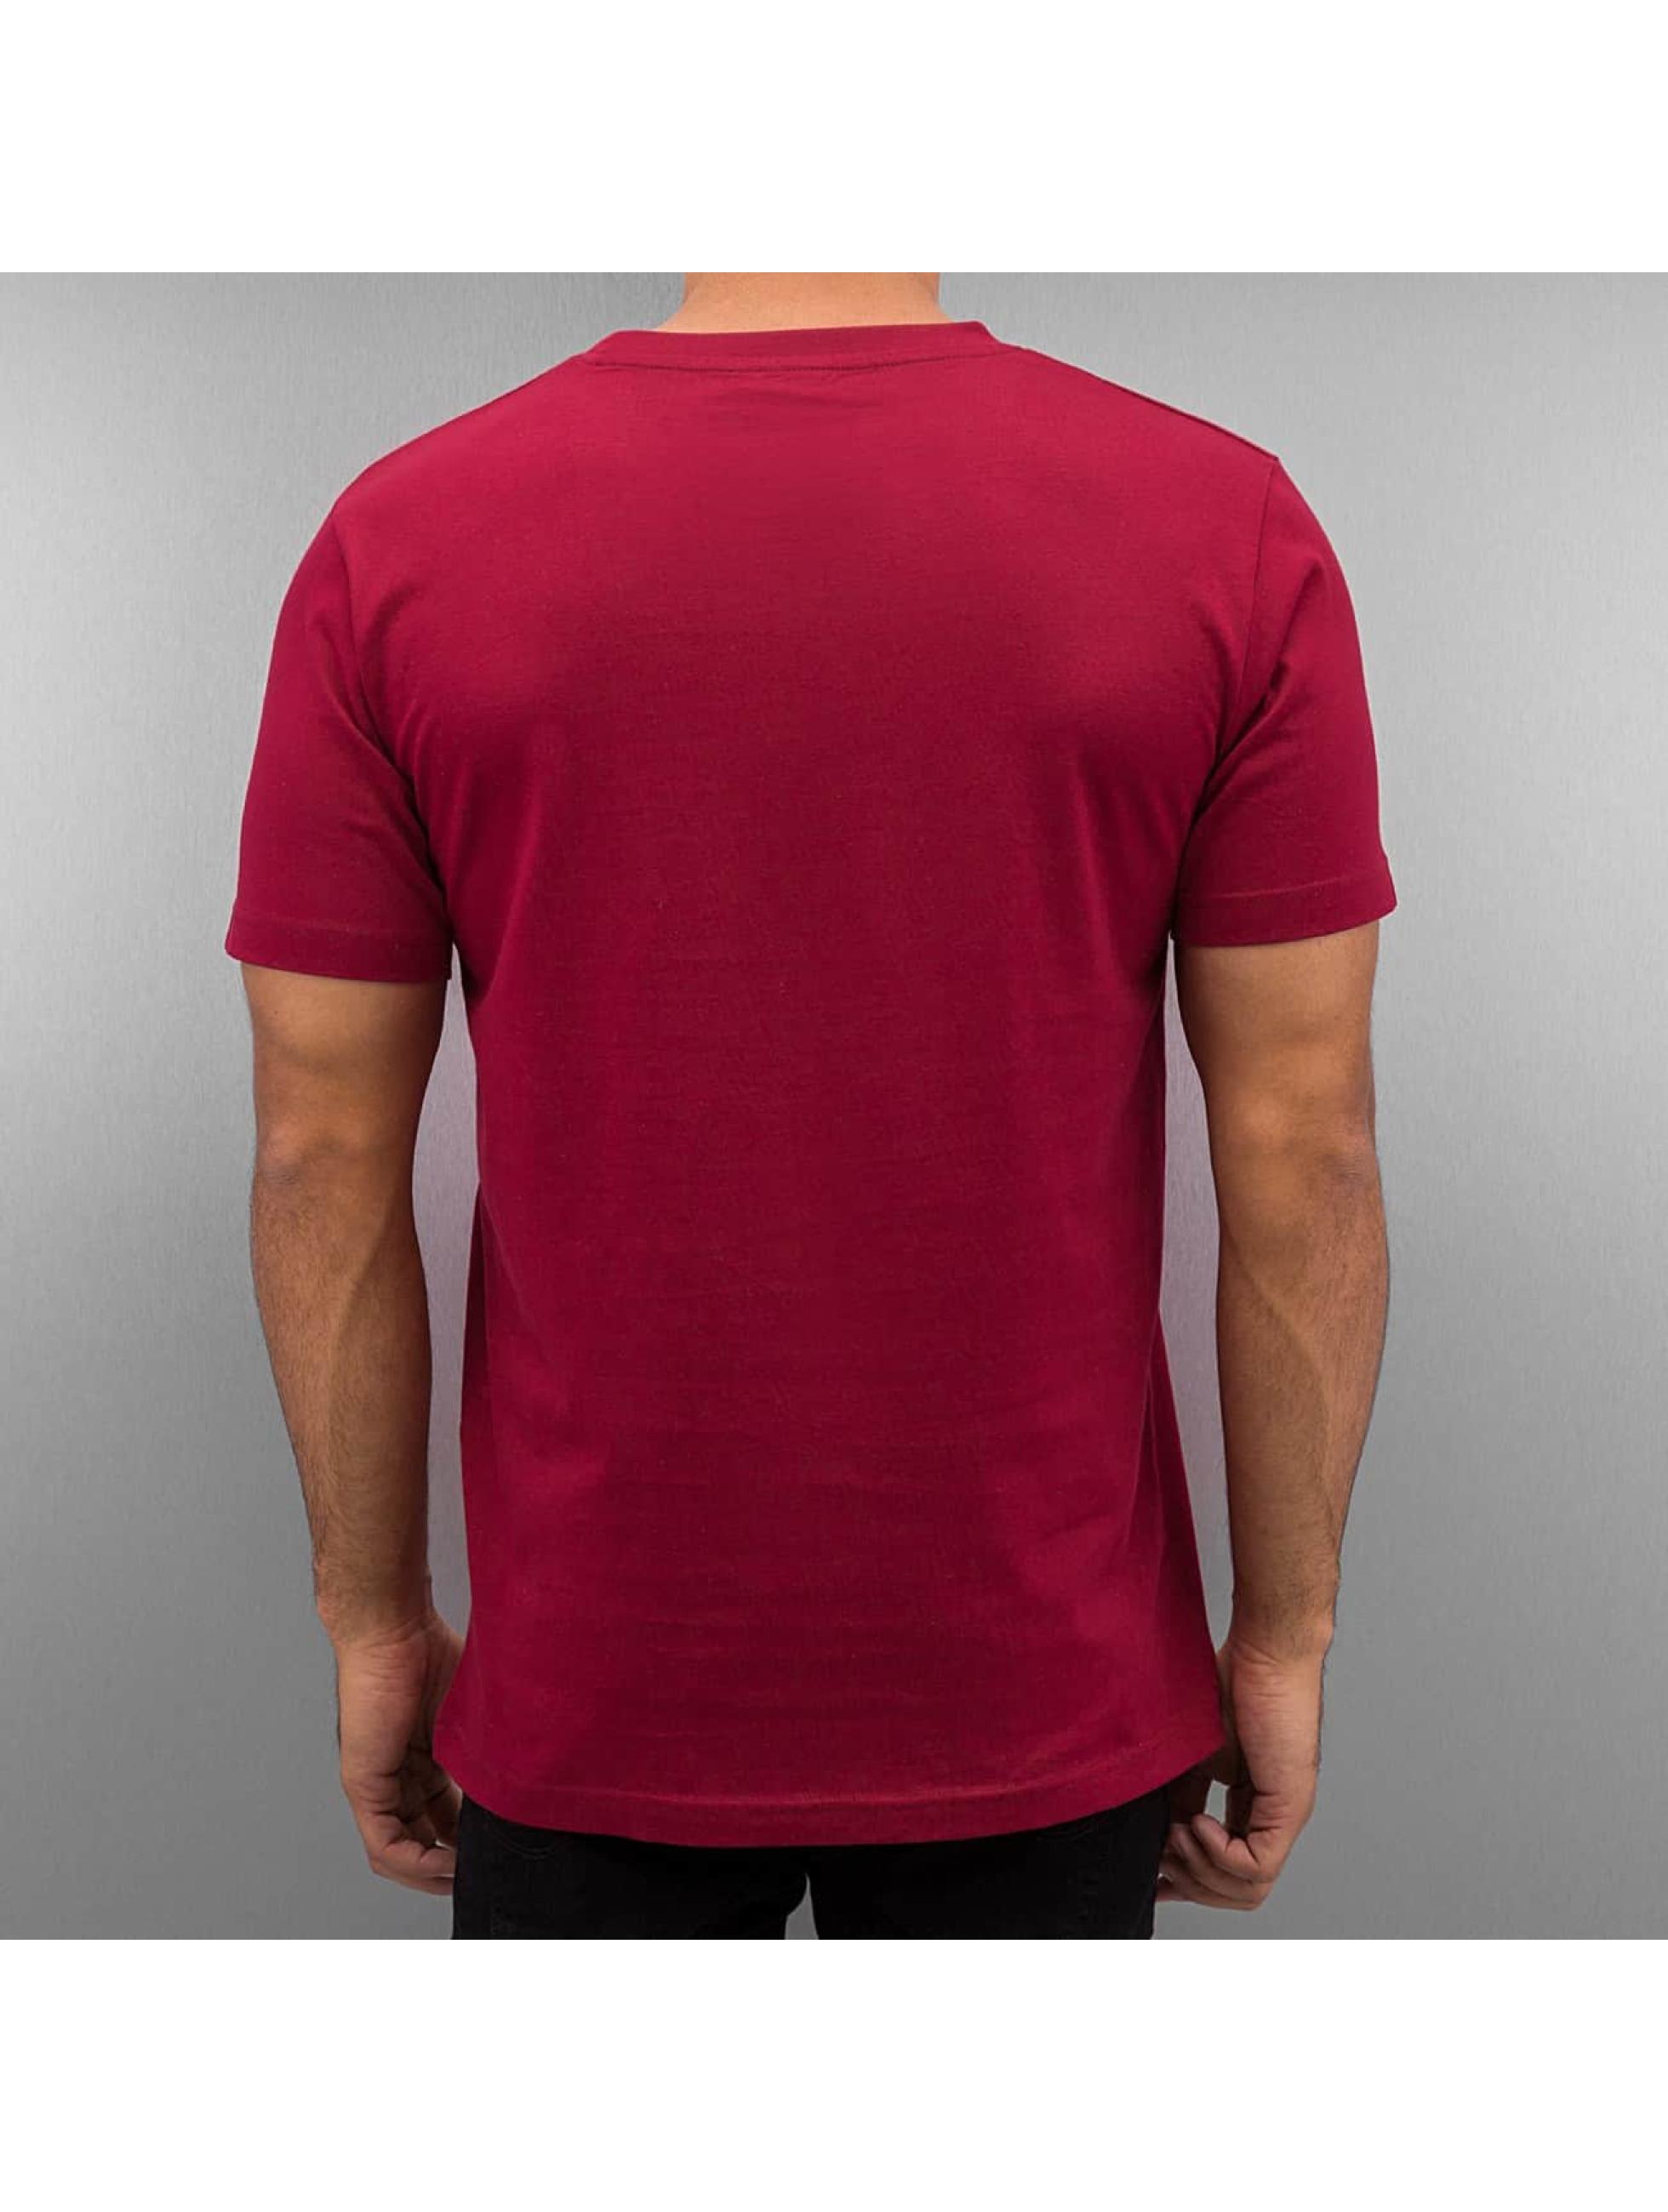 Mister Tee t-shirt Ballin rood